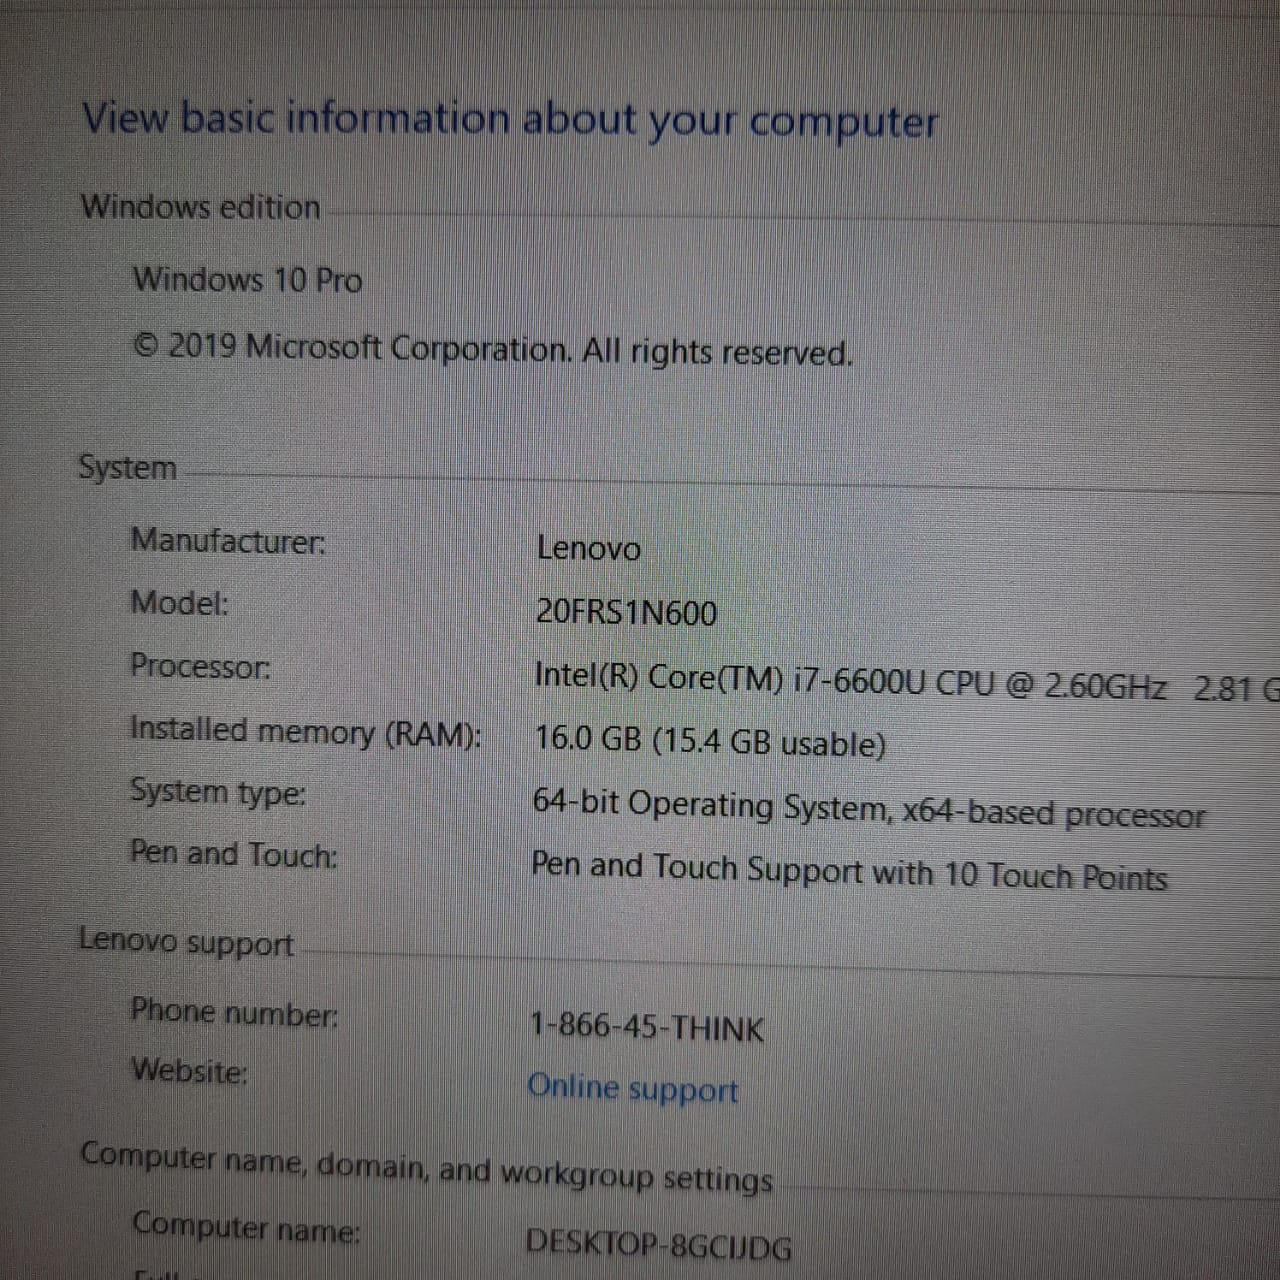 Thinkpad Lenovo X1 Yoga core i7, 16GB RAM, 360 Touch Screen